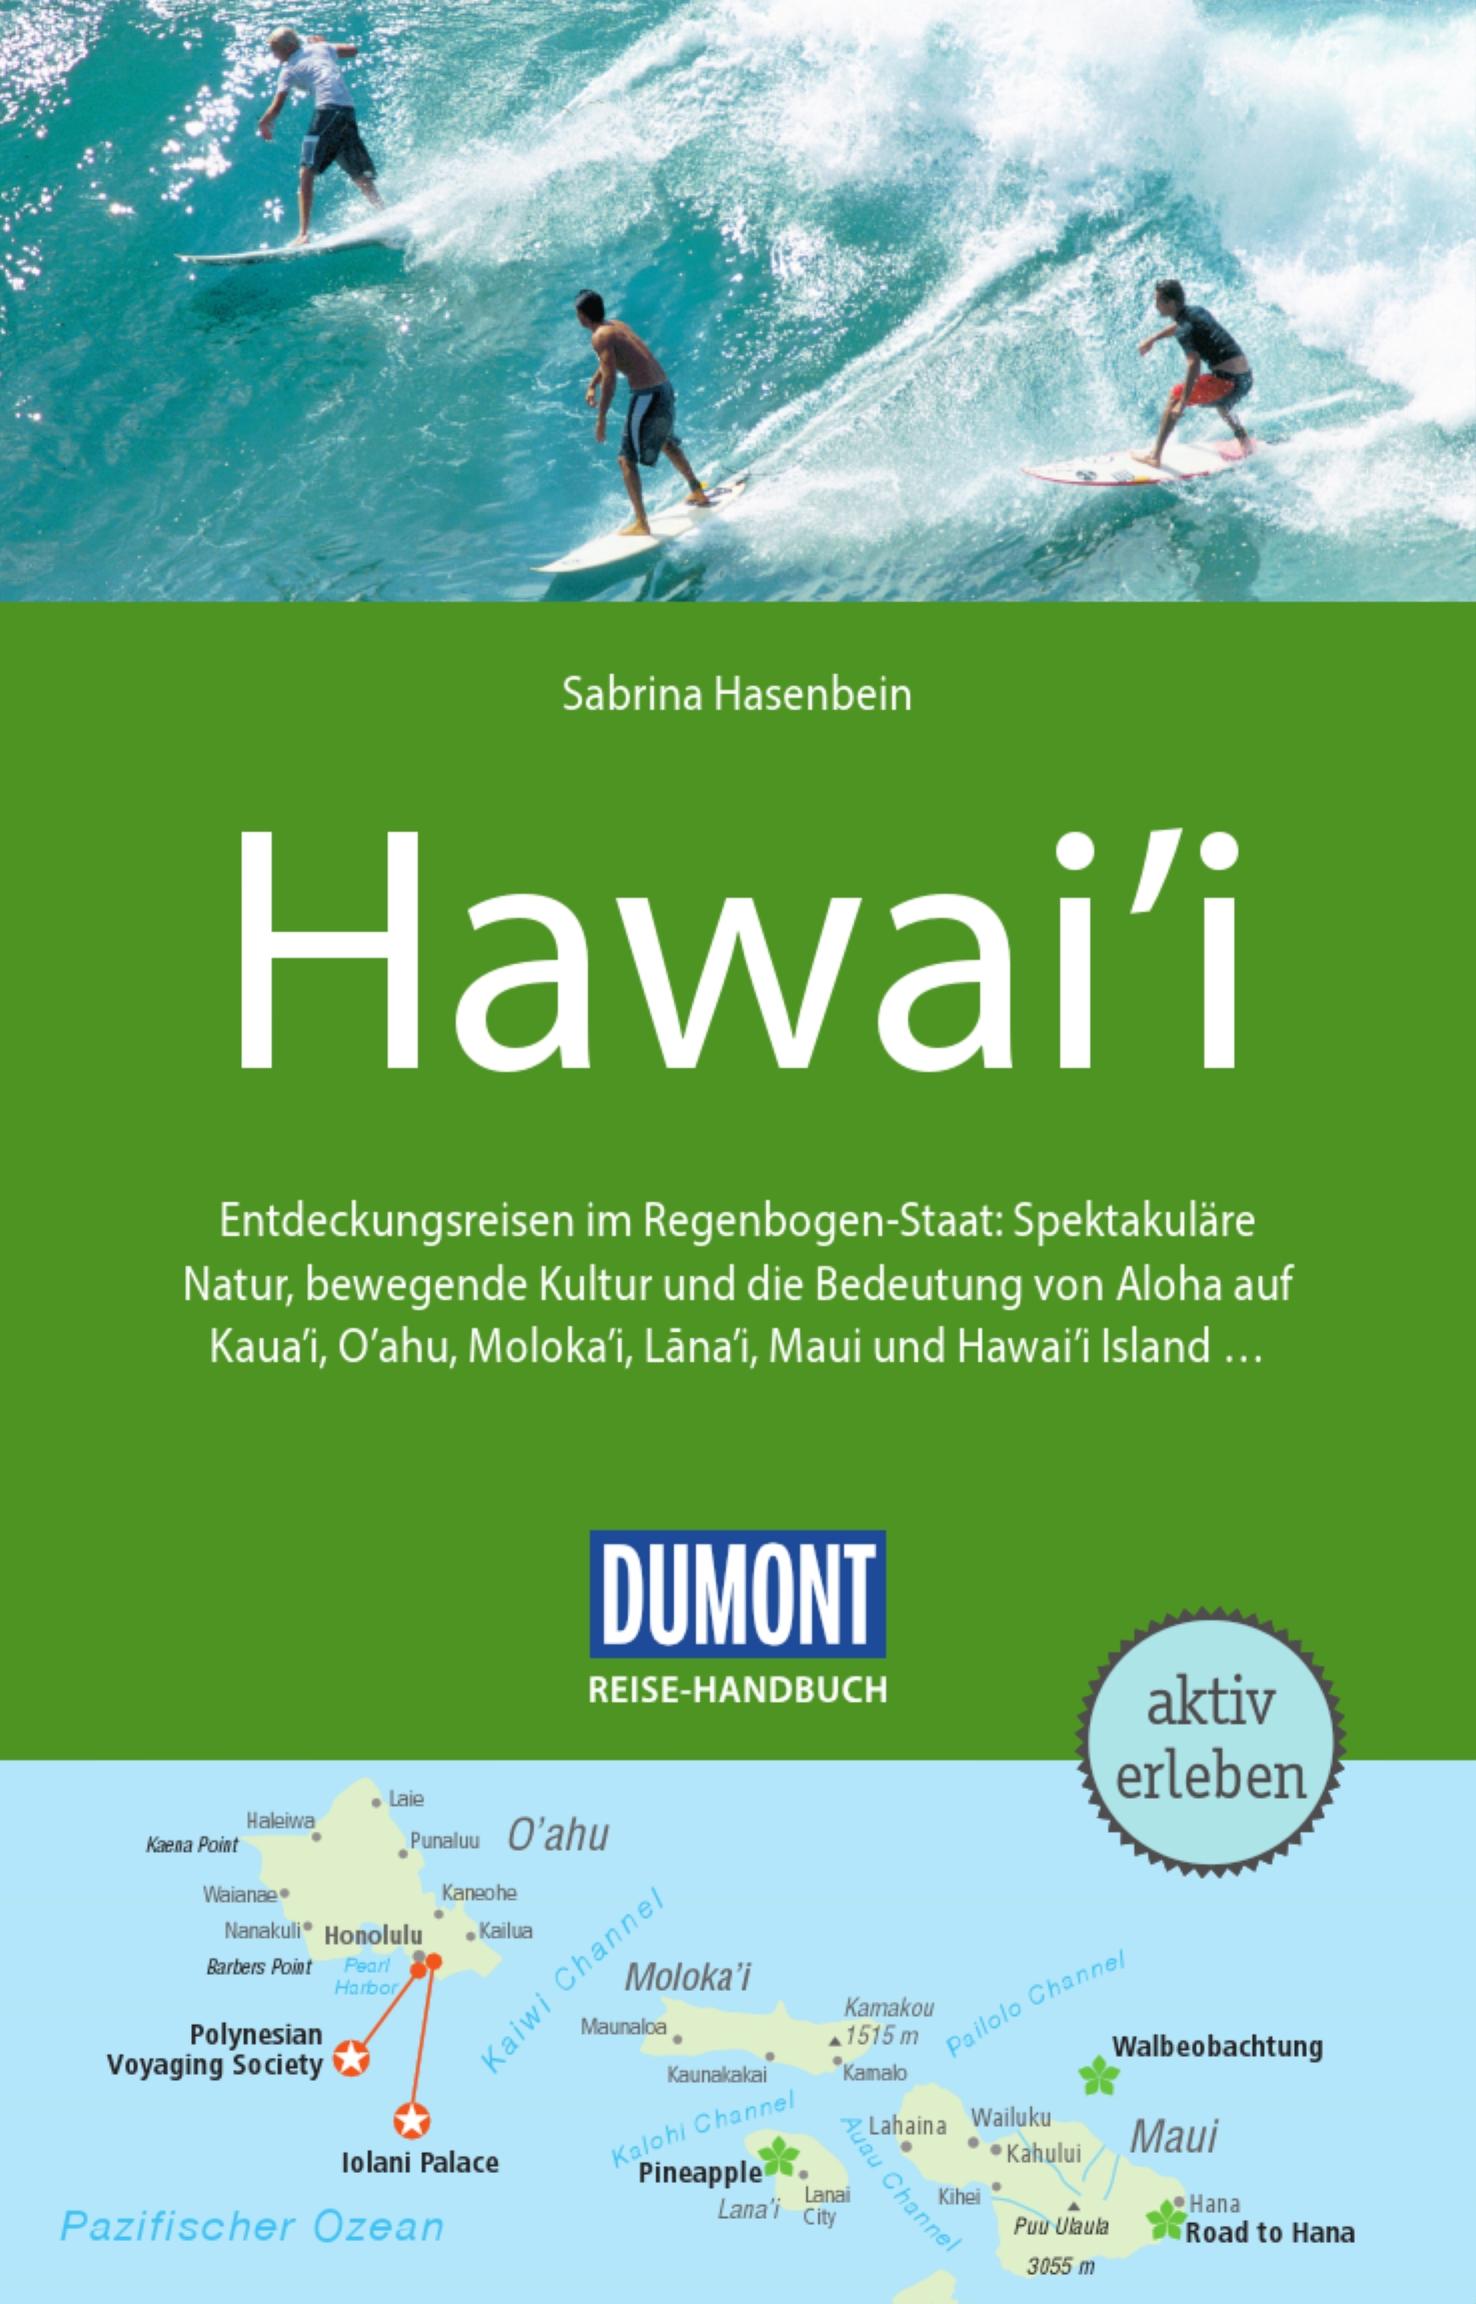 DuMont Reise-Handbuch - Hawaii (Cover)